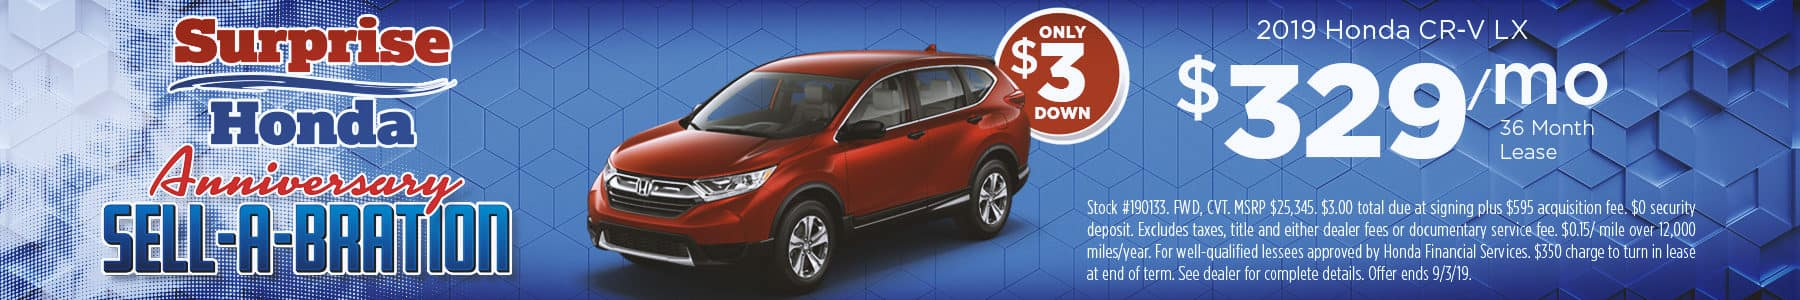 Honda Dealership Az >> Surprise Honda Premier Honda Dealership In The Greater Phoenix Area